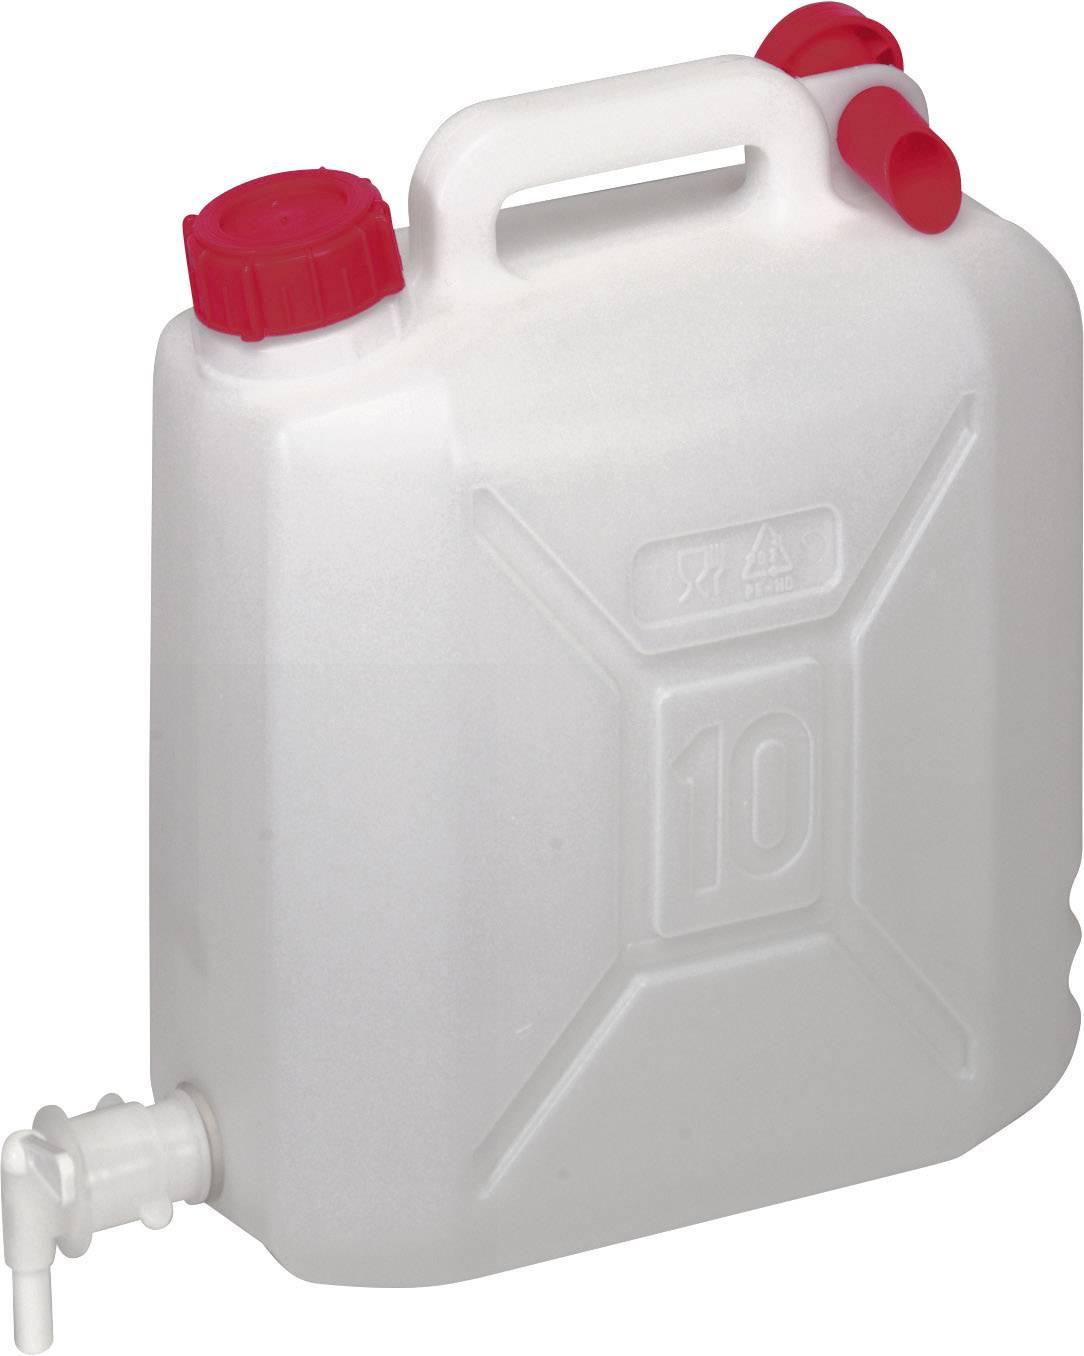 Kanister na vodu s kohútikom LaPlaya 869400, 10 l